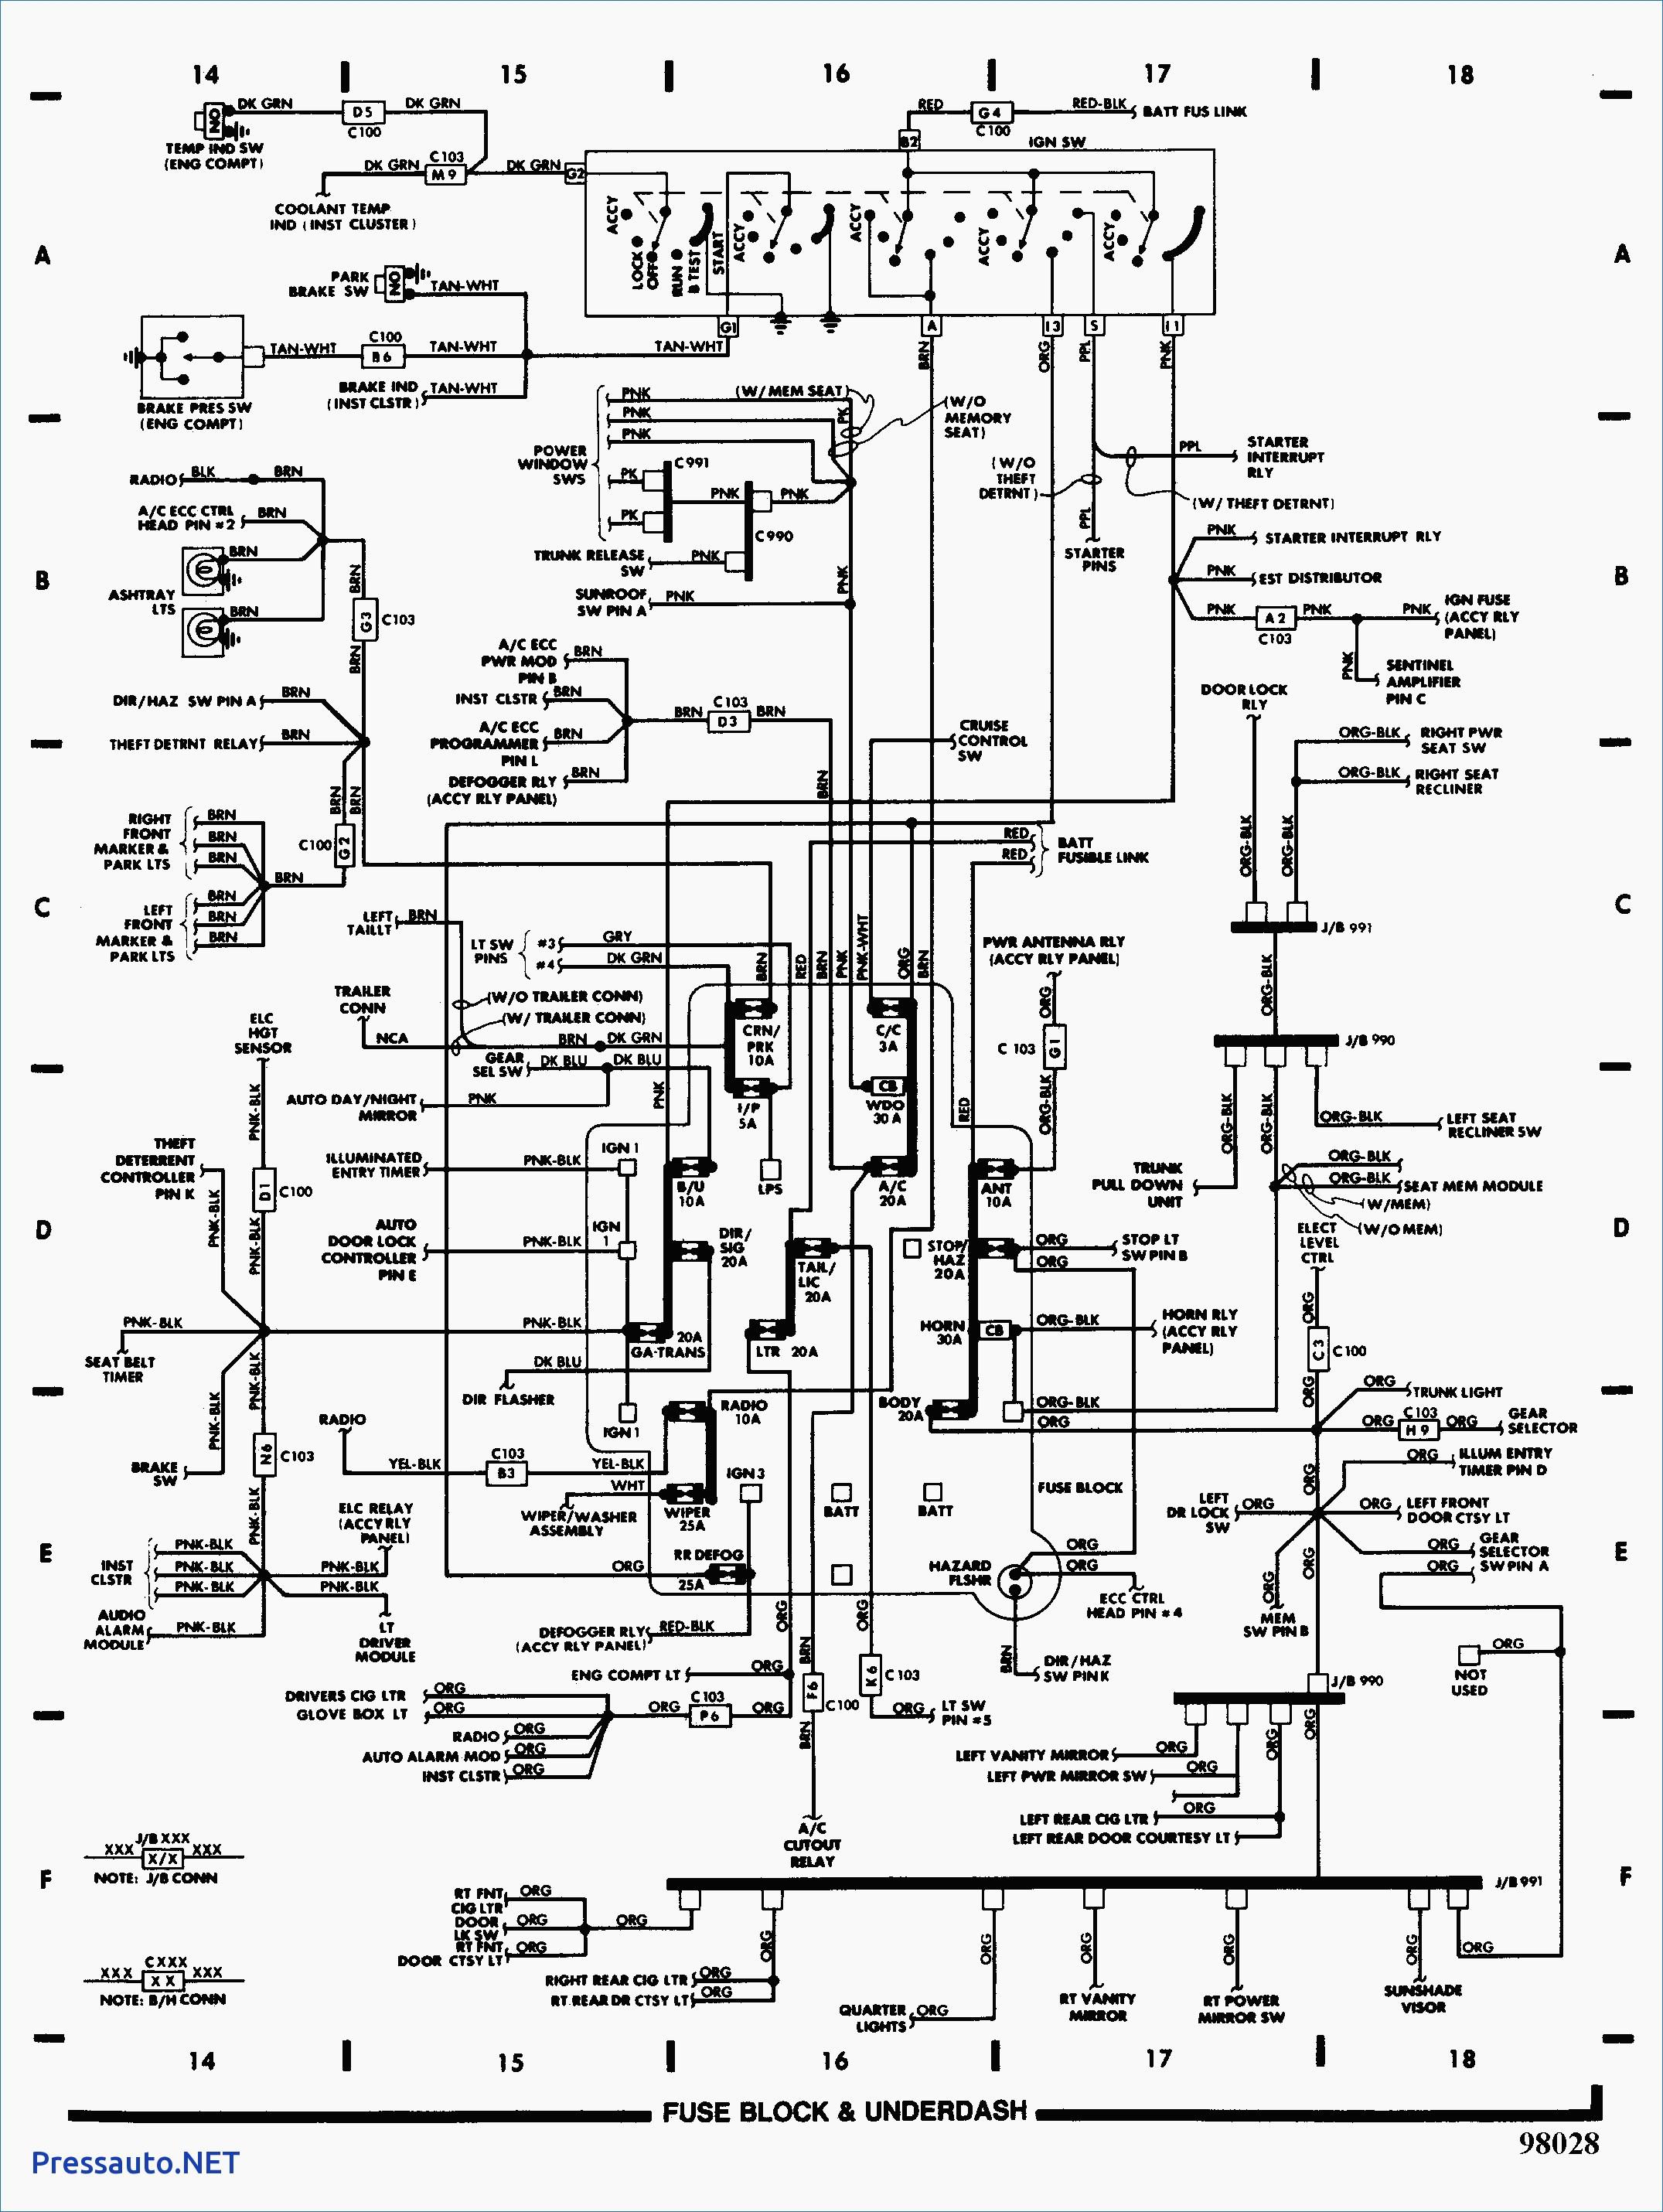 700R4 Wiring Diagram - Lorestan - 700R4 Wiring Diagram